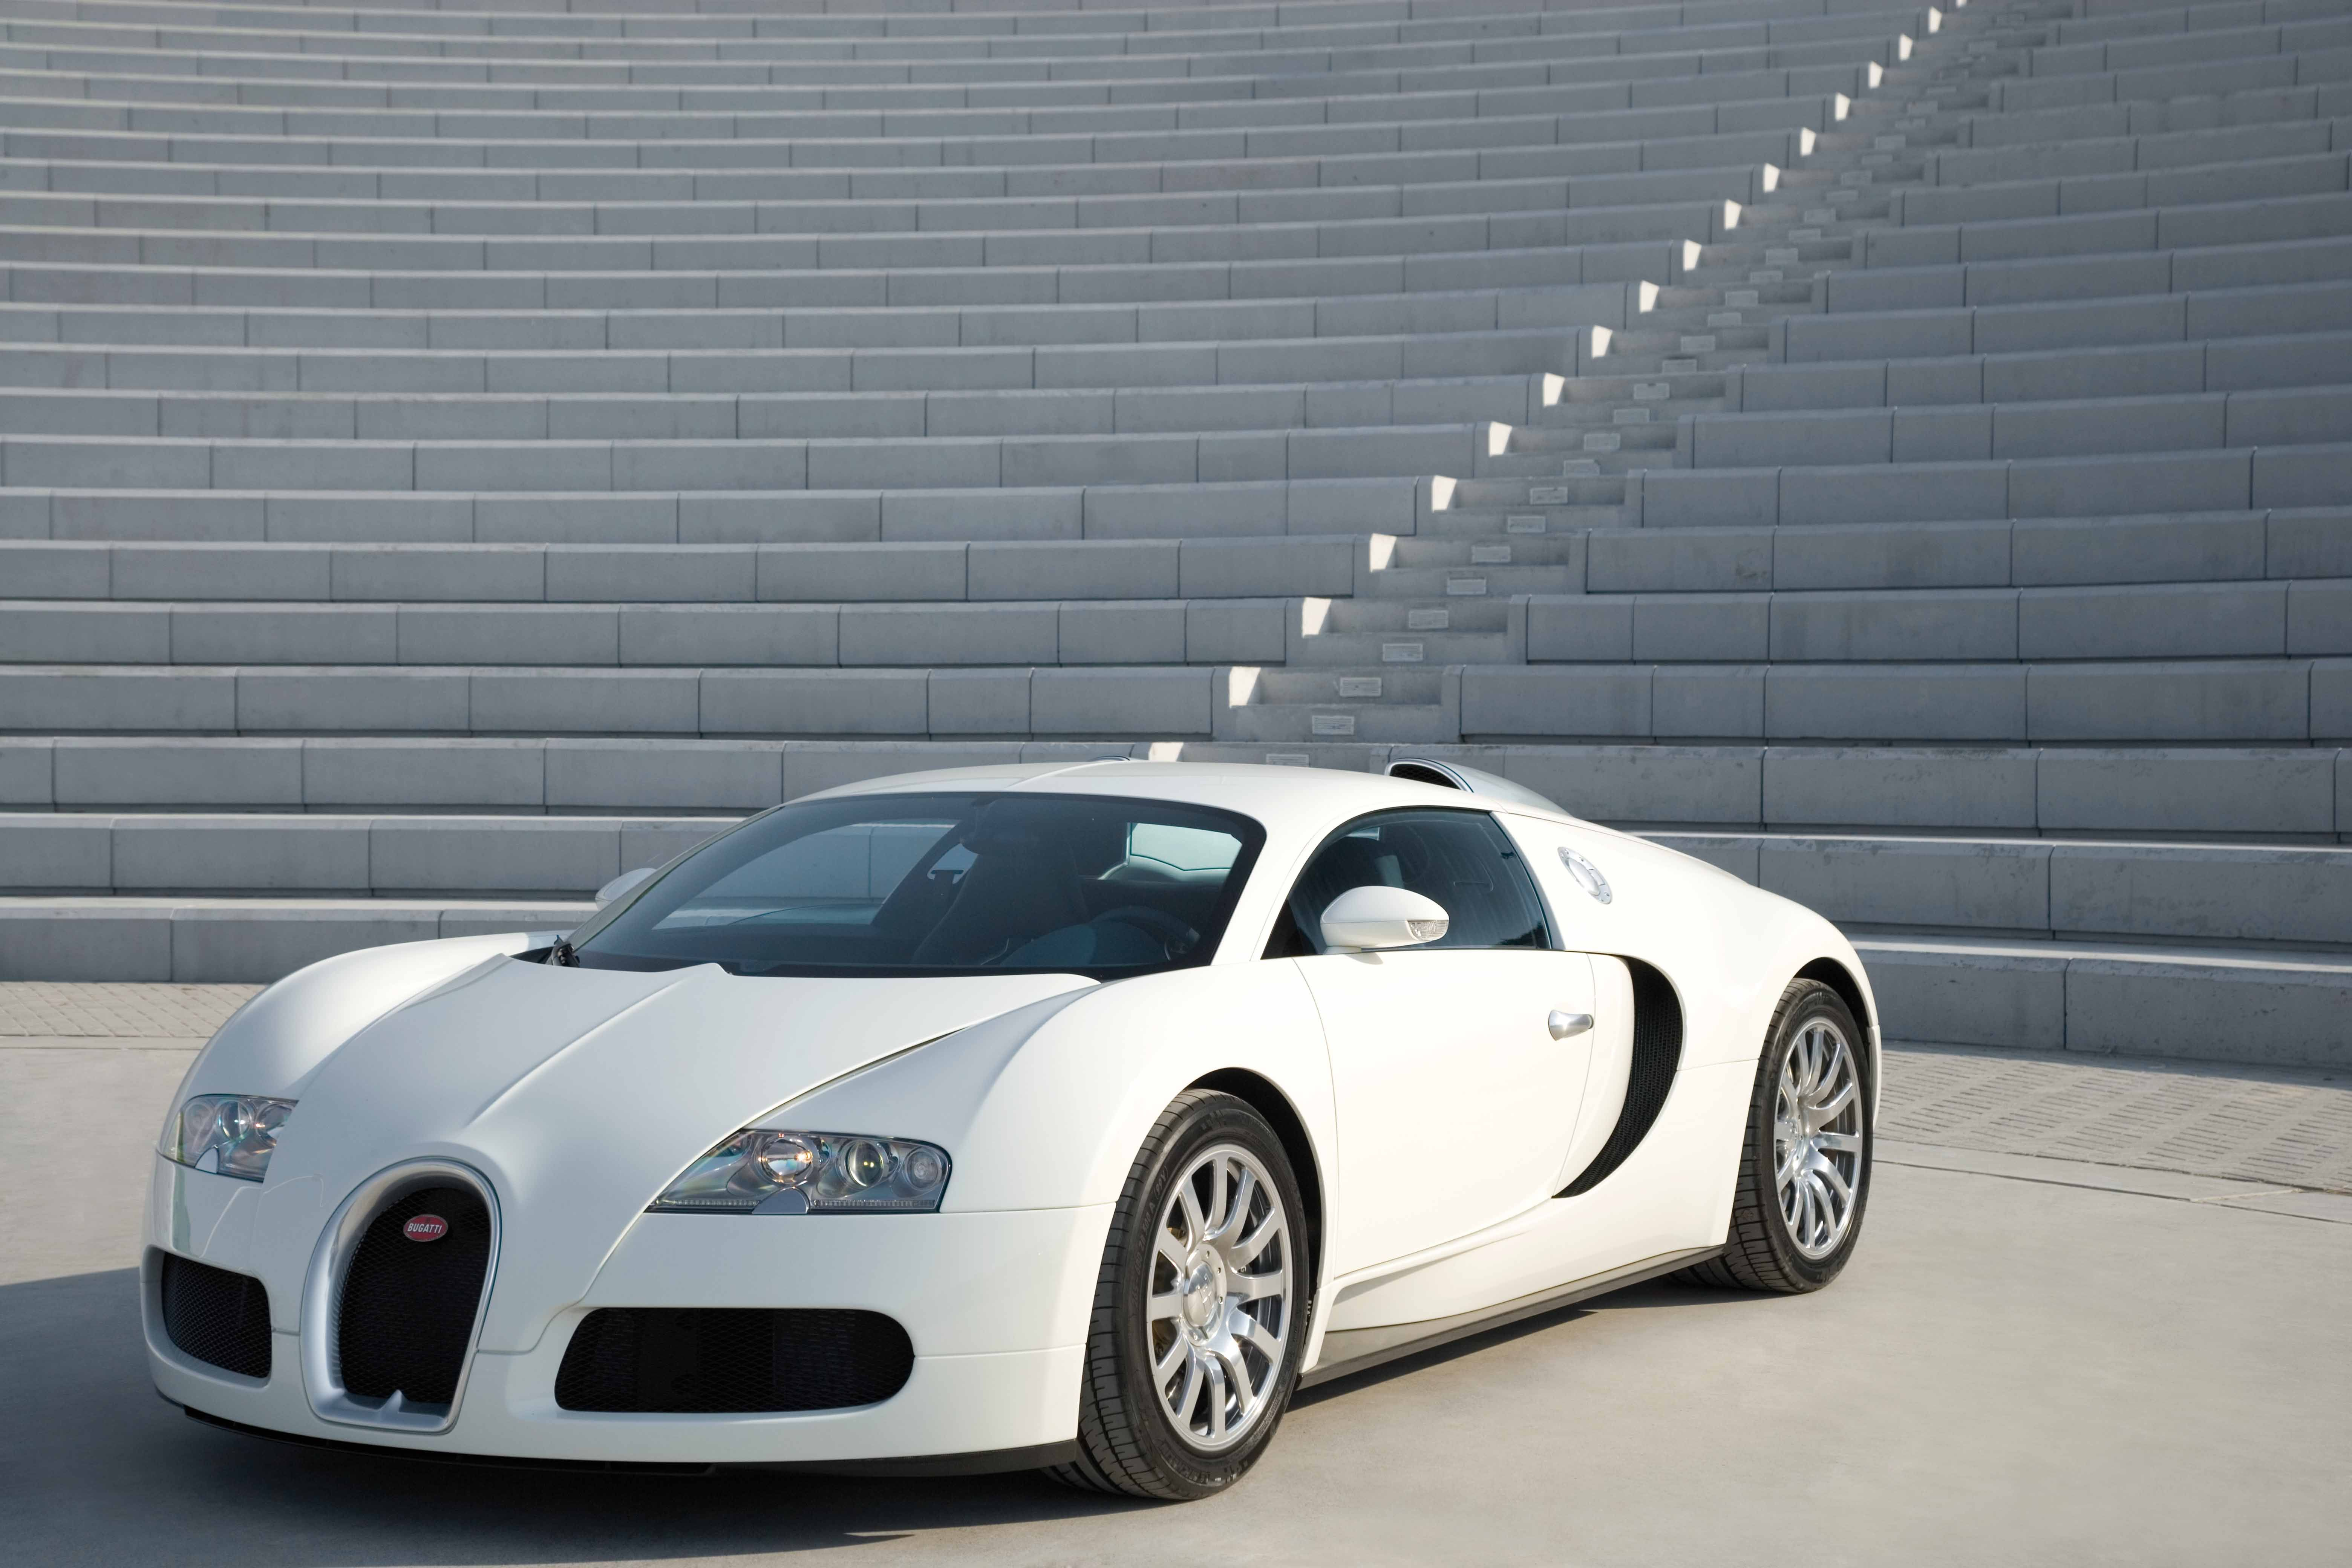 0ba21889bd71e27fcf3c82a854970115 Inspiring Bugatti Veyron Price Australian Dollars Cars Trend